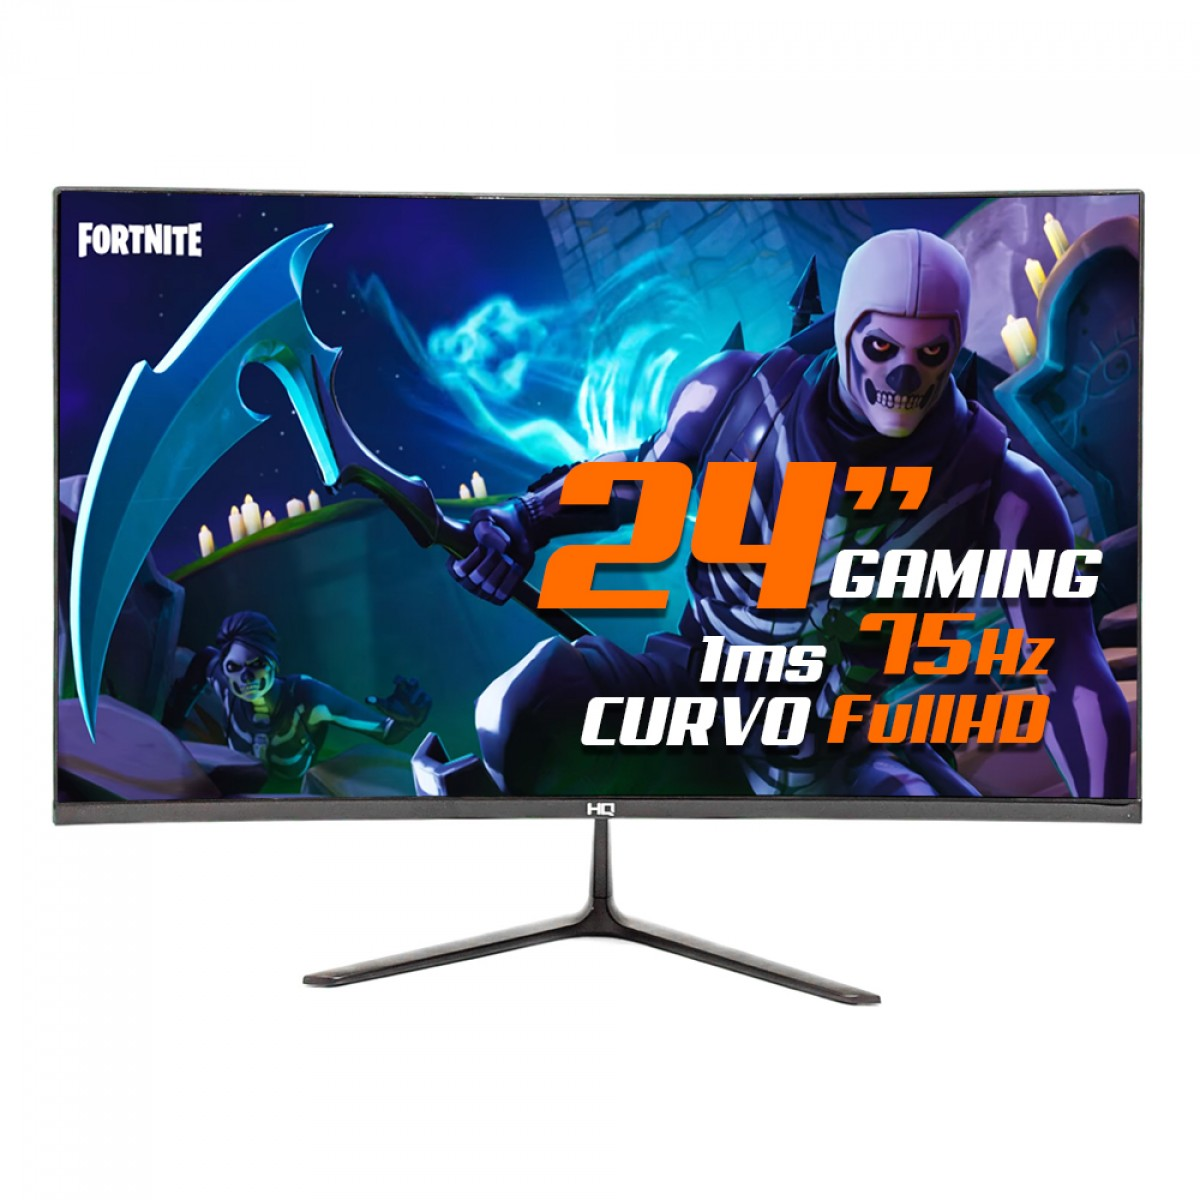 Monitor Gamer HQ 24 Pol, FullHD, 1ms, Curvo, 24HQ CURVO BLACK